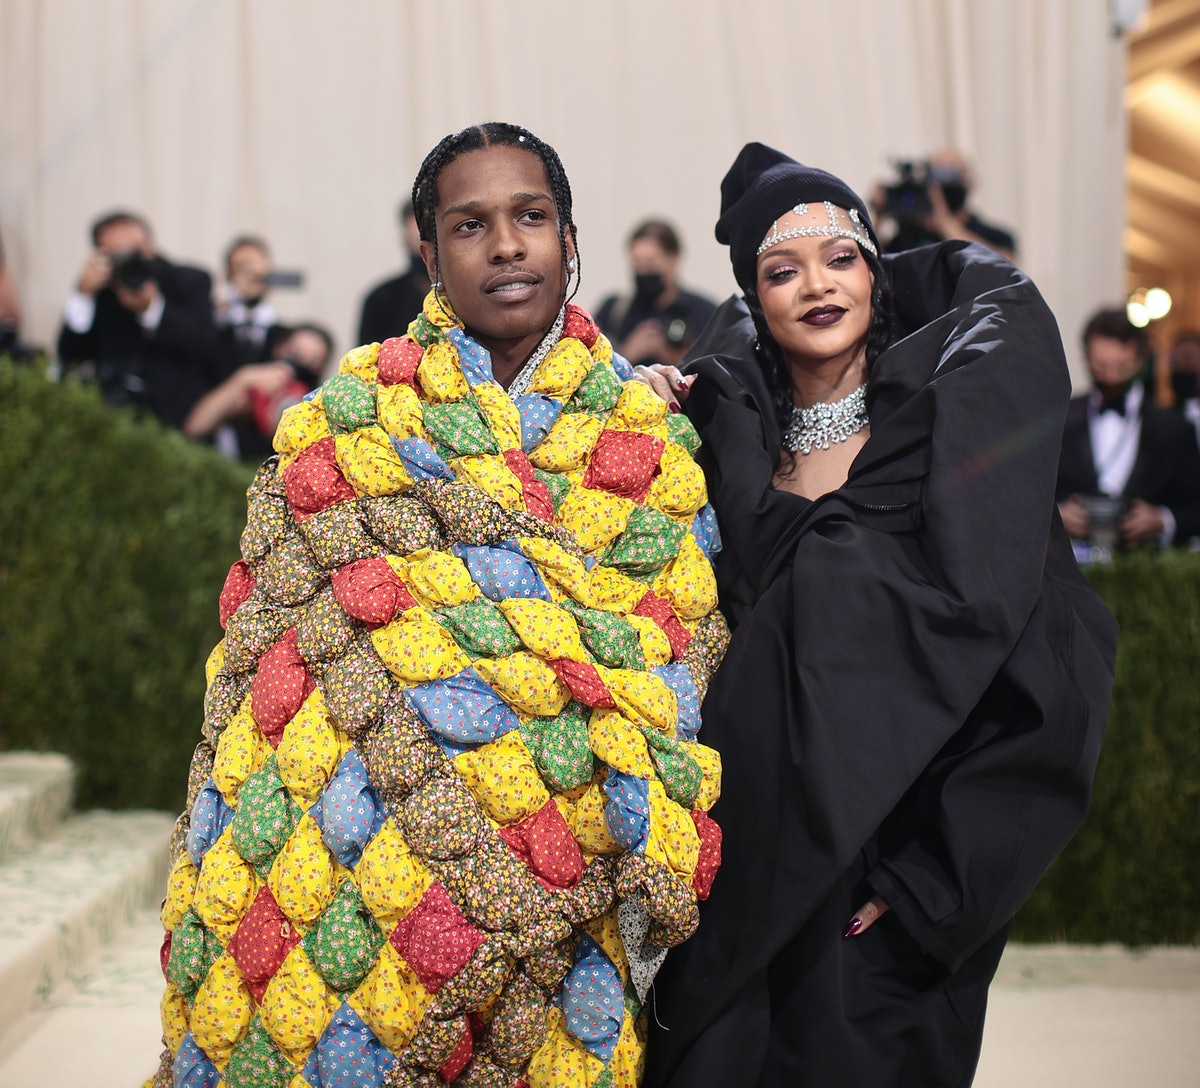 A$AP Rocky and Rihanna at Met Gala